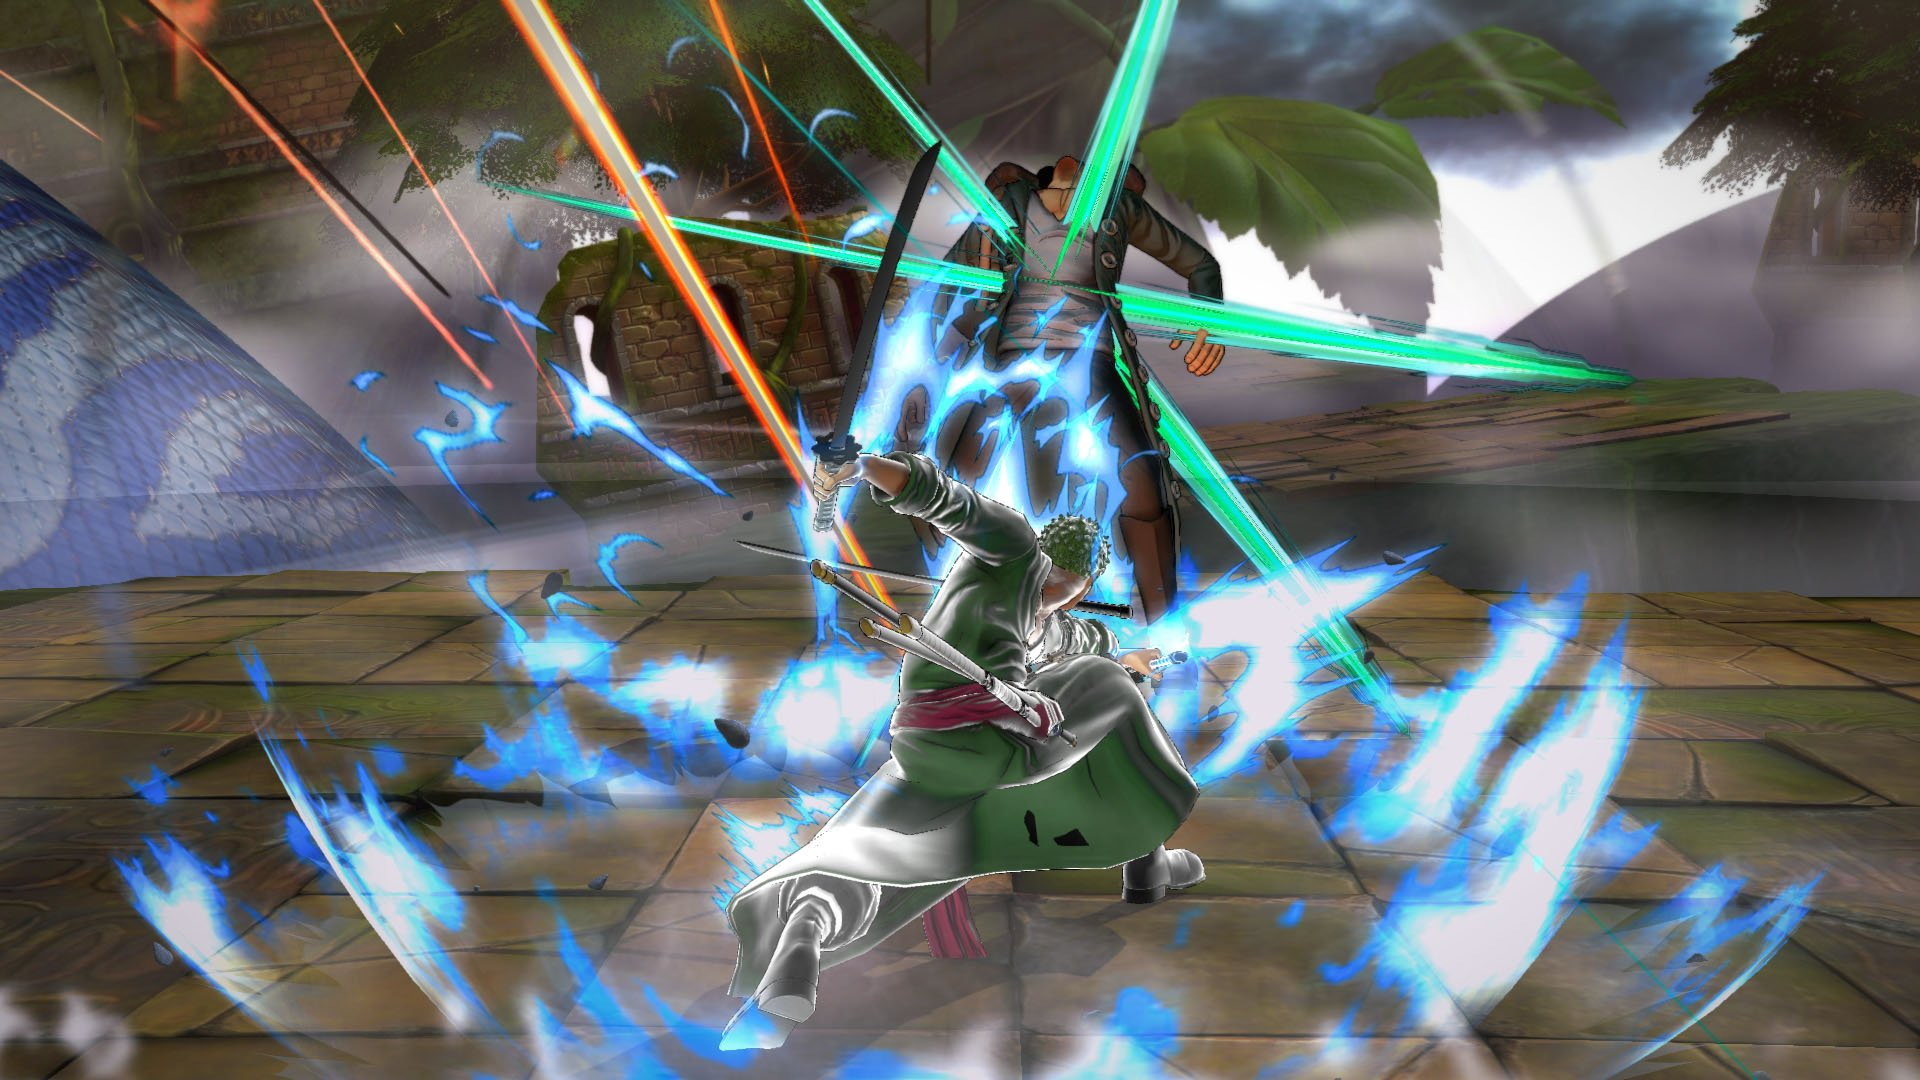 Zoro_Haki_5_1448271571 One Piece: Burning Blood Characters